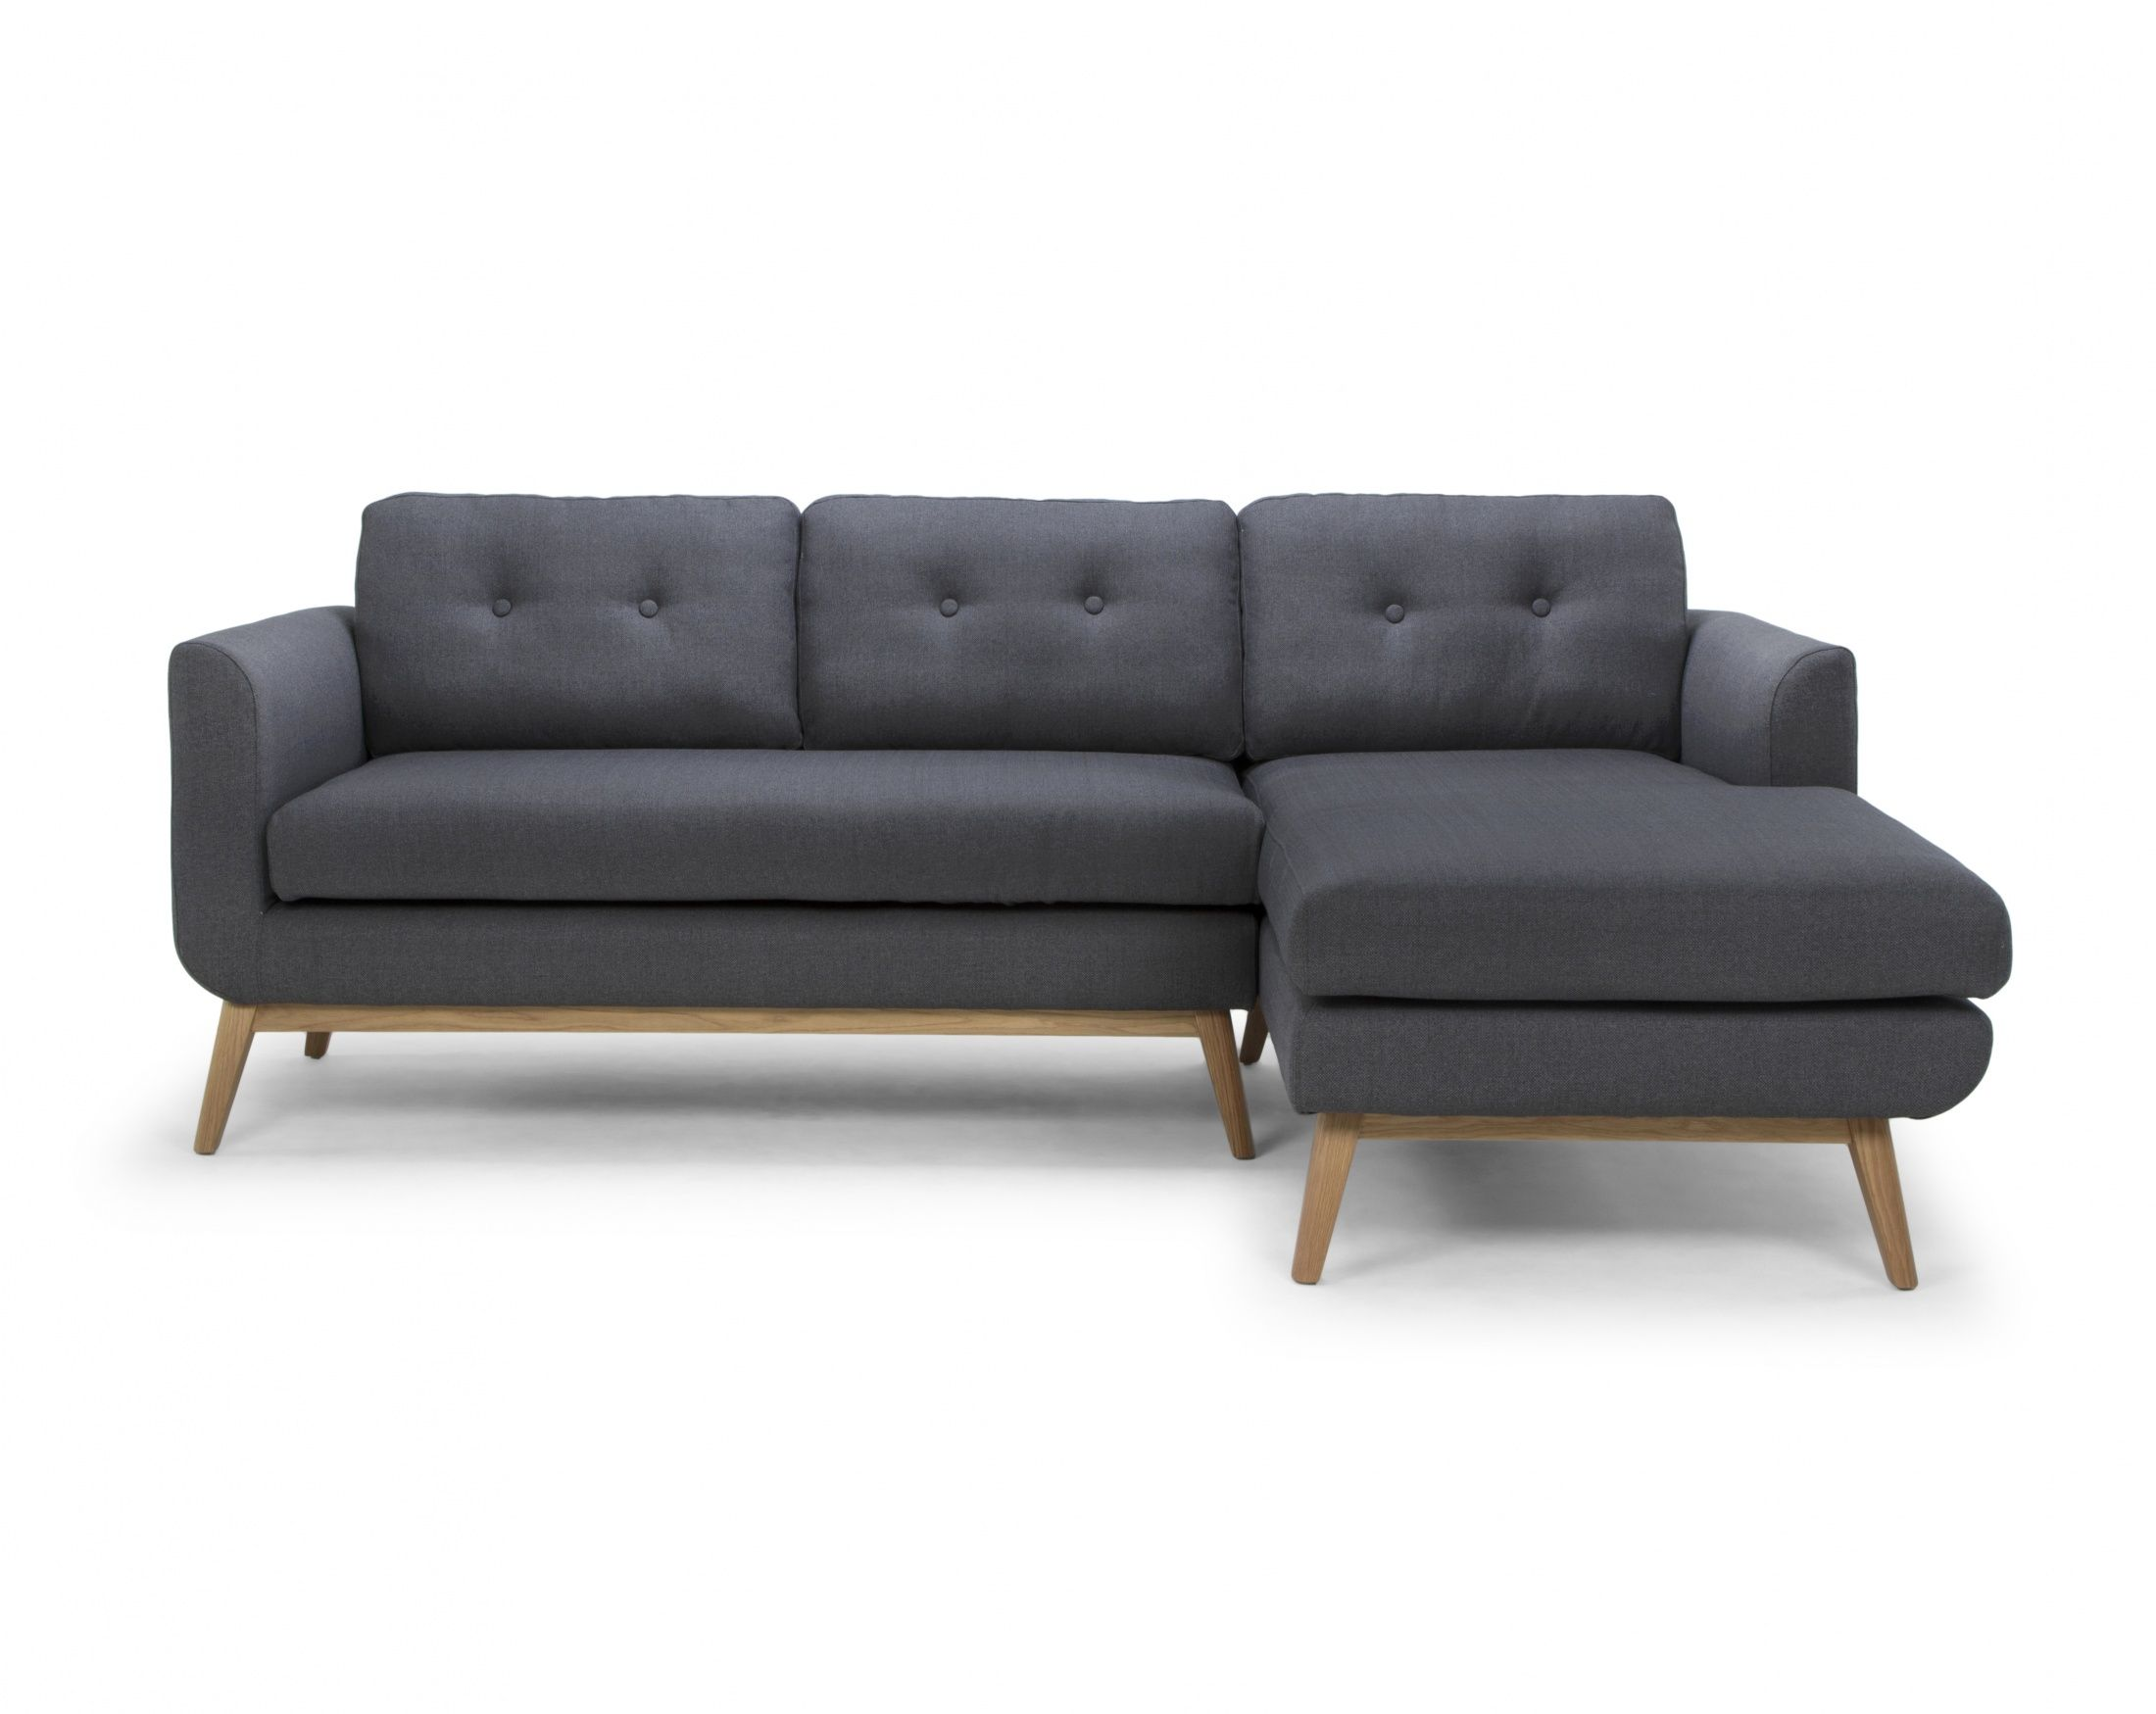 Freya Corner Sofa Design Midcentury Modern Mid Century